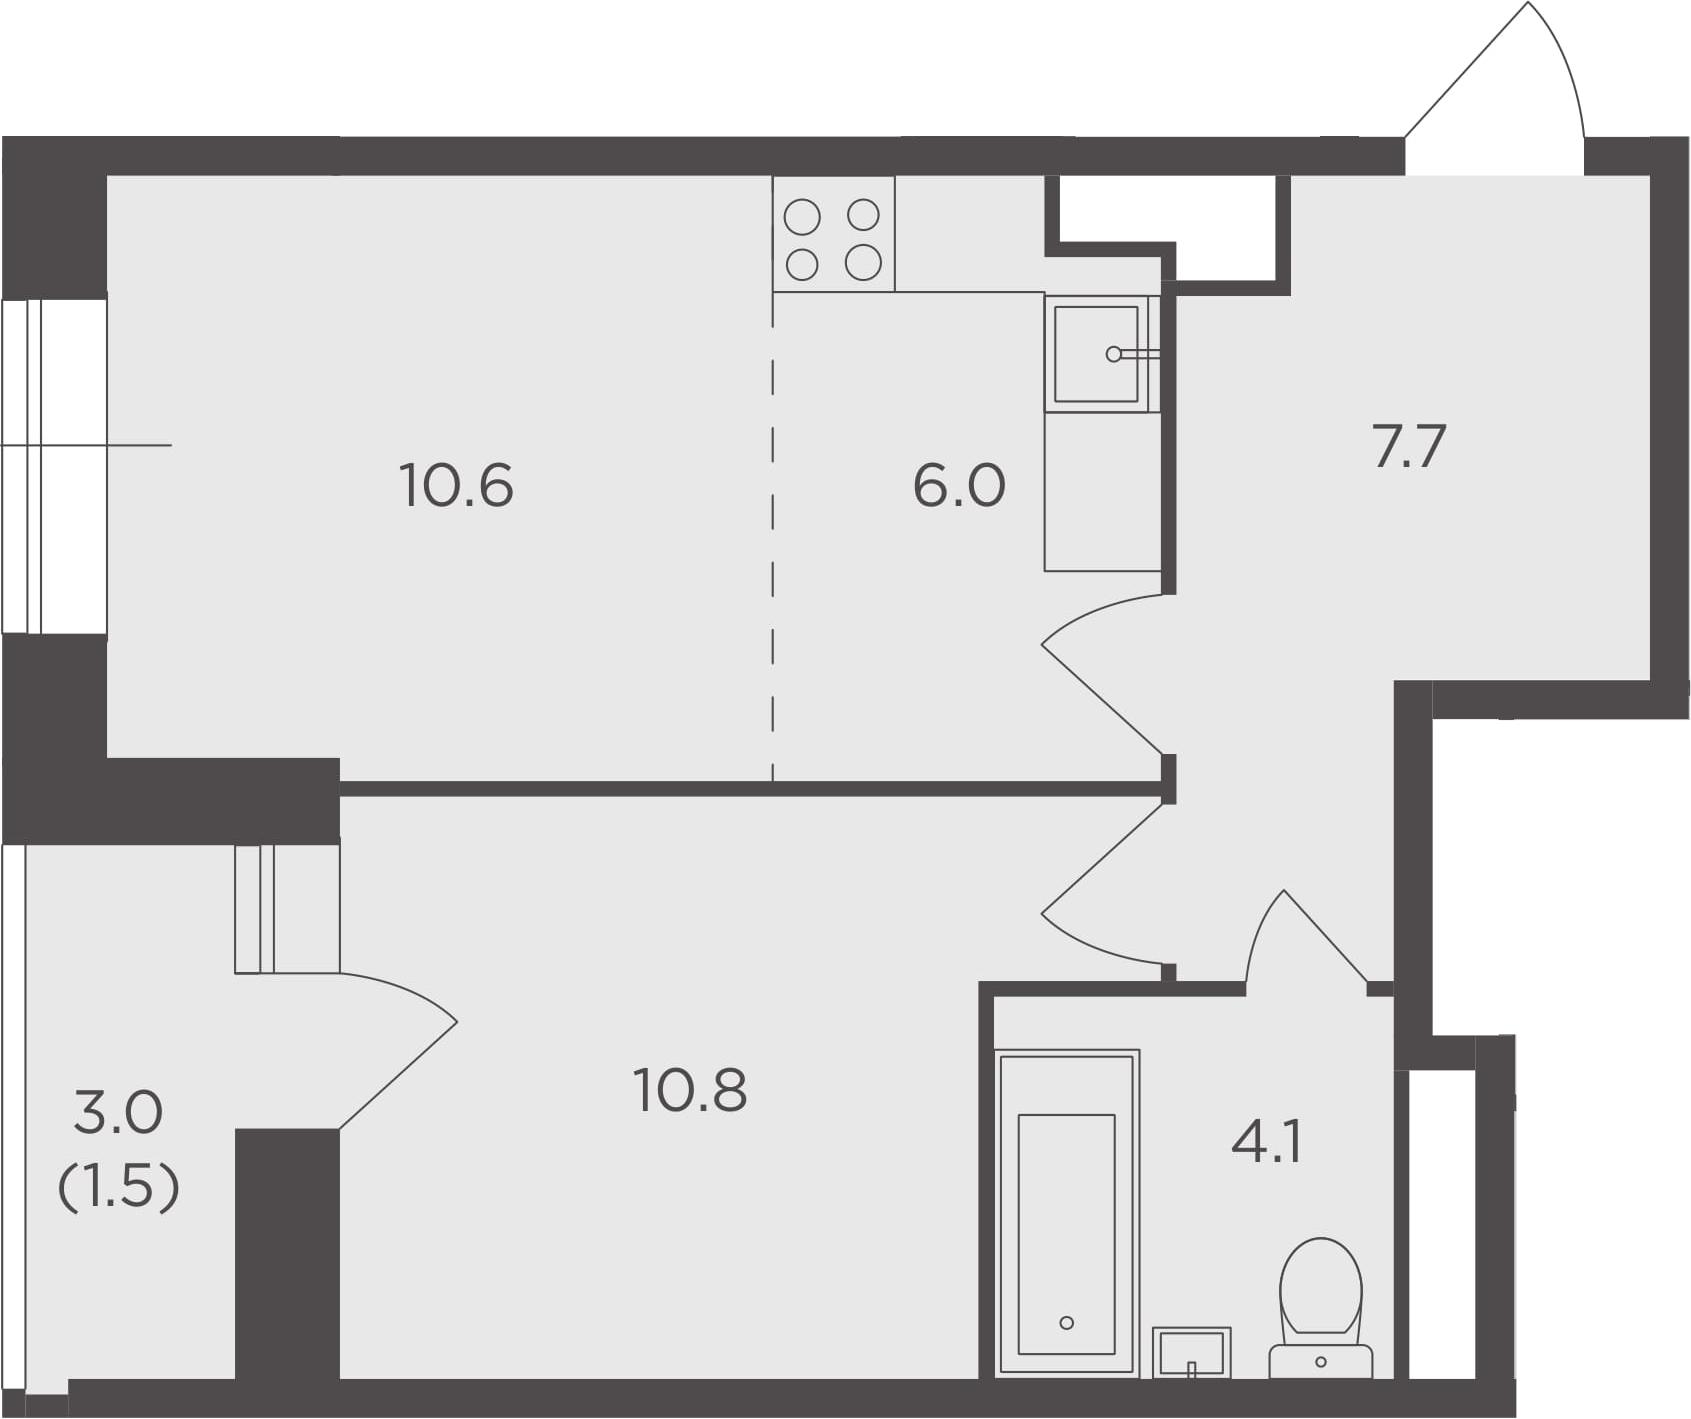 2Е-комнатная квартира, 40.7 м², 12 этаж – Планировка